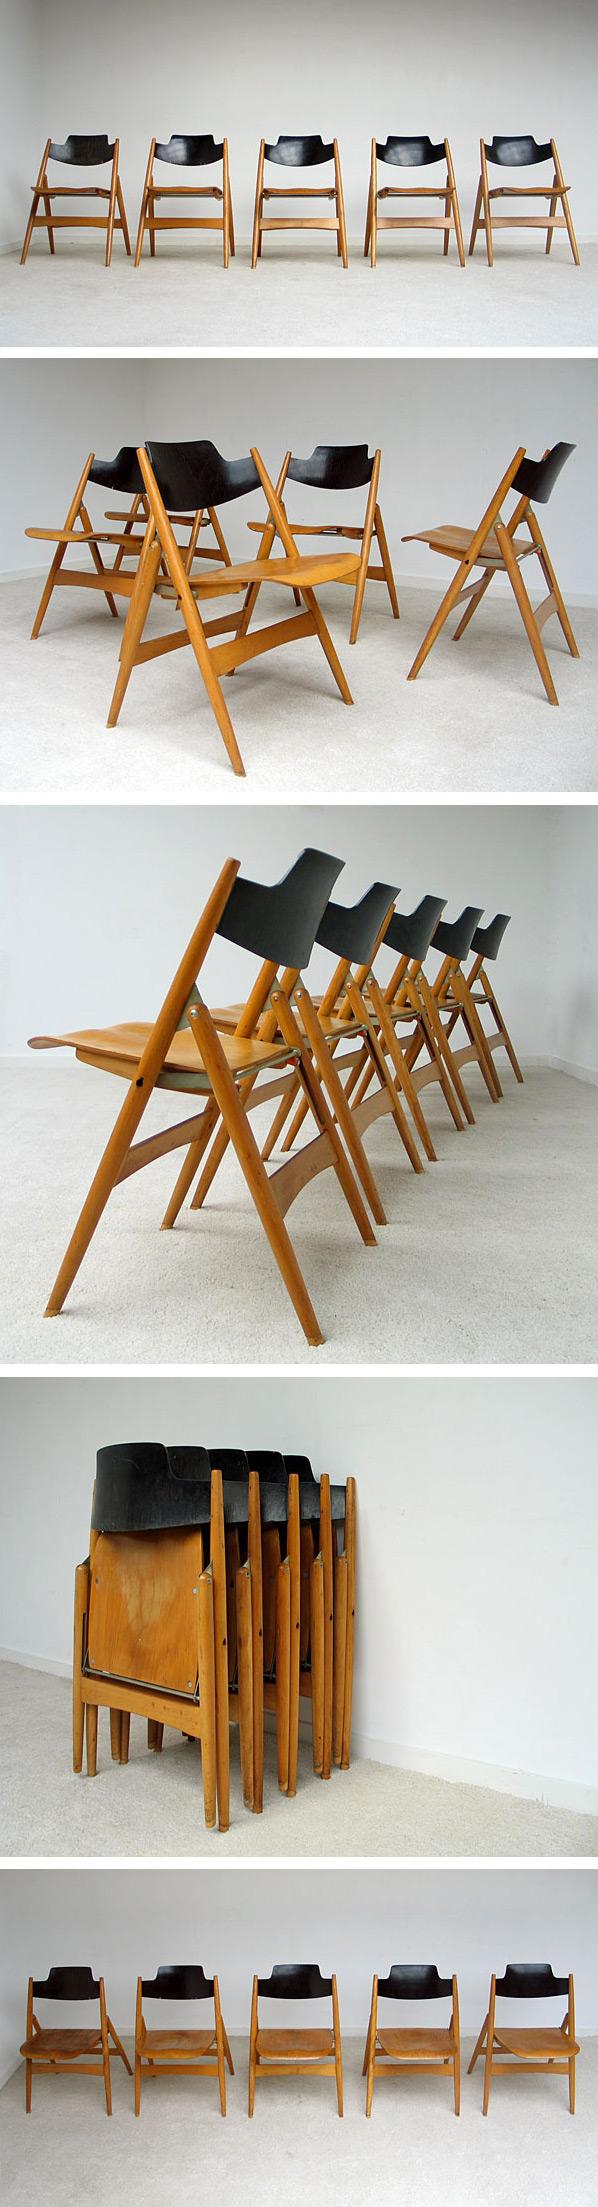 5 Folding chairs Model SE 18 Egon Eiermann Large